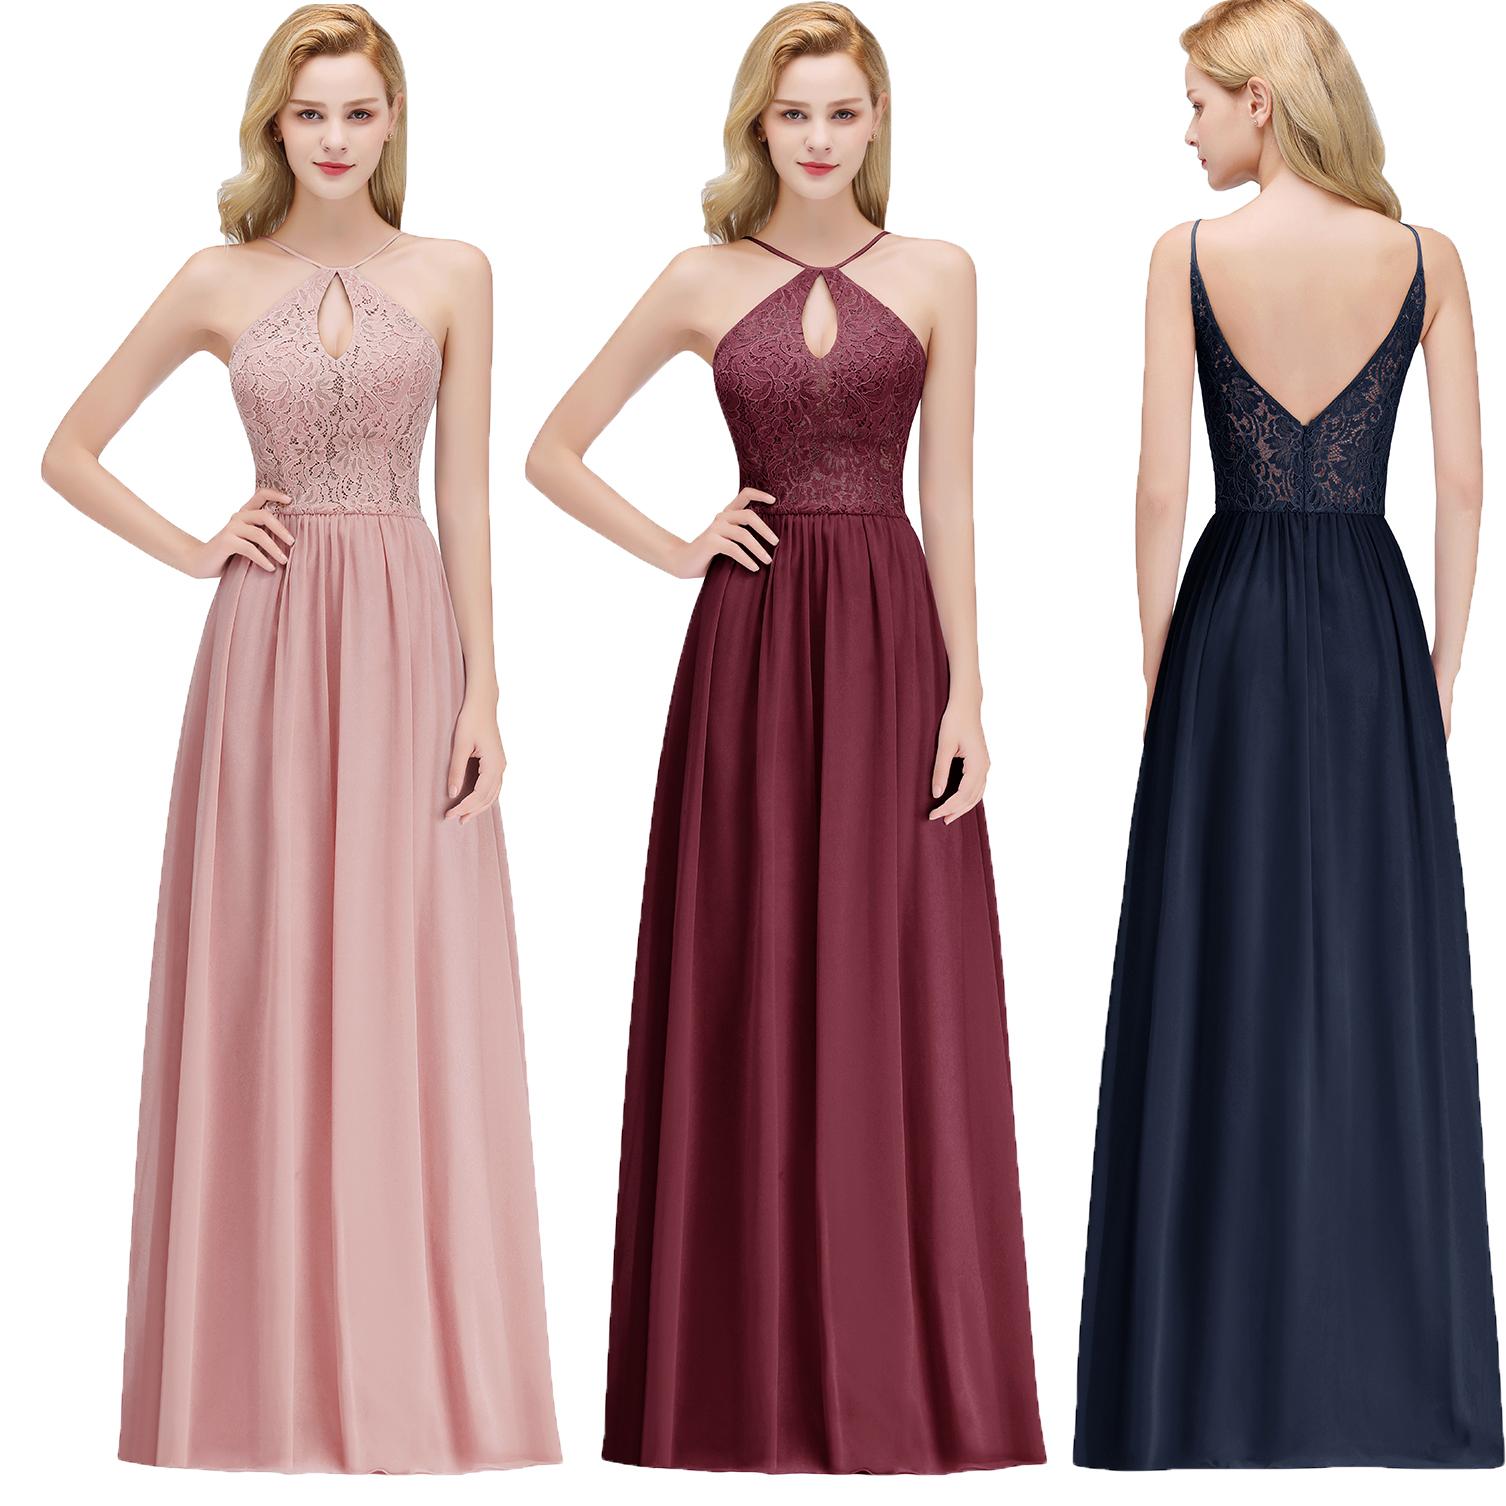 bridesmaid dresses resale, OFF 77%,Buy!